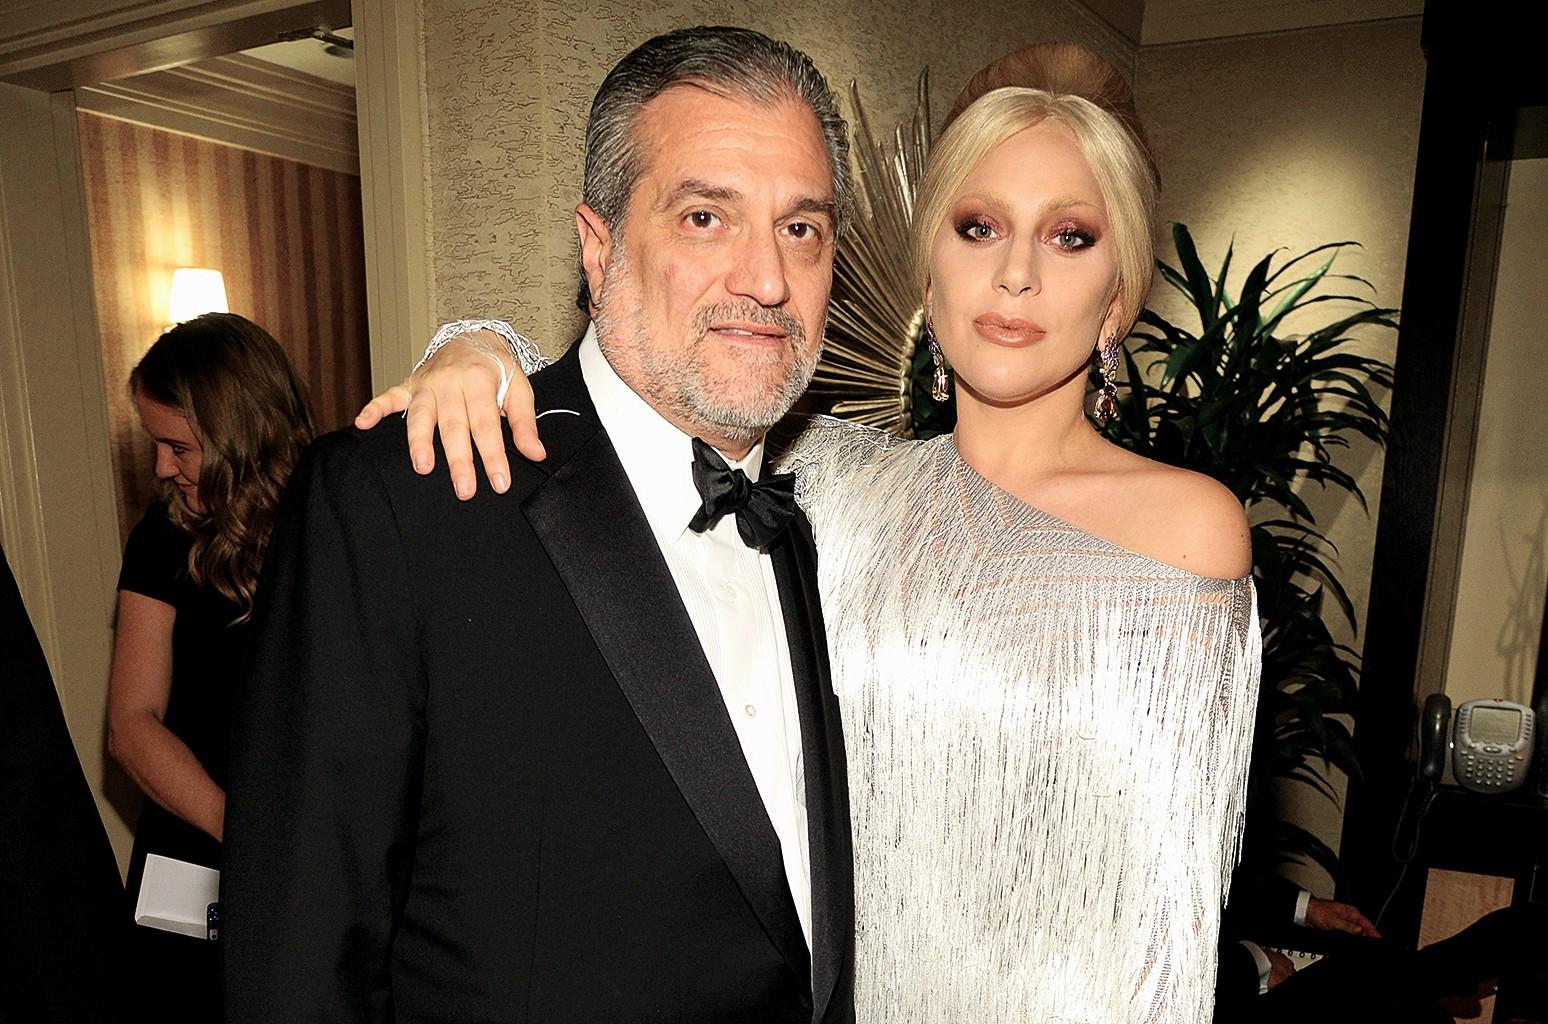 Joe Germanotta & Lady Gaga